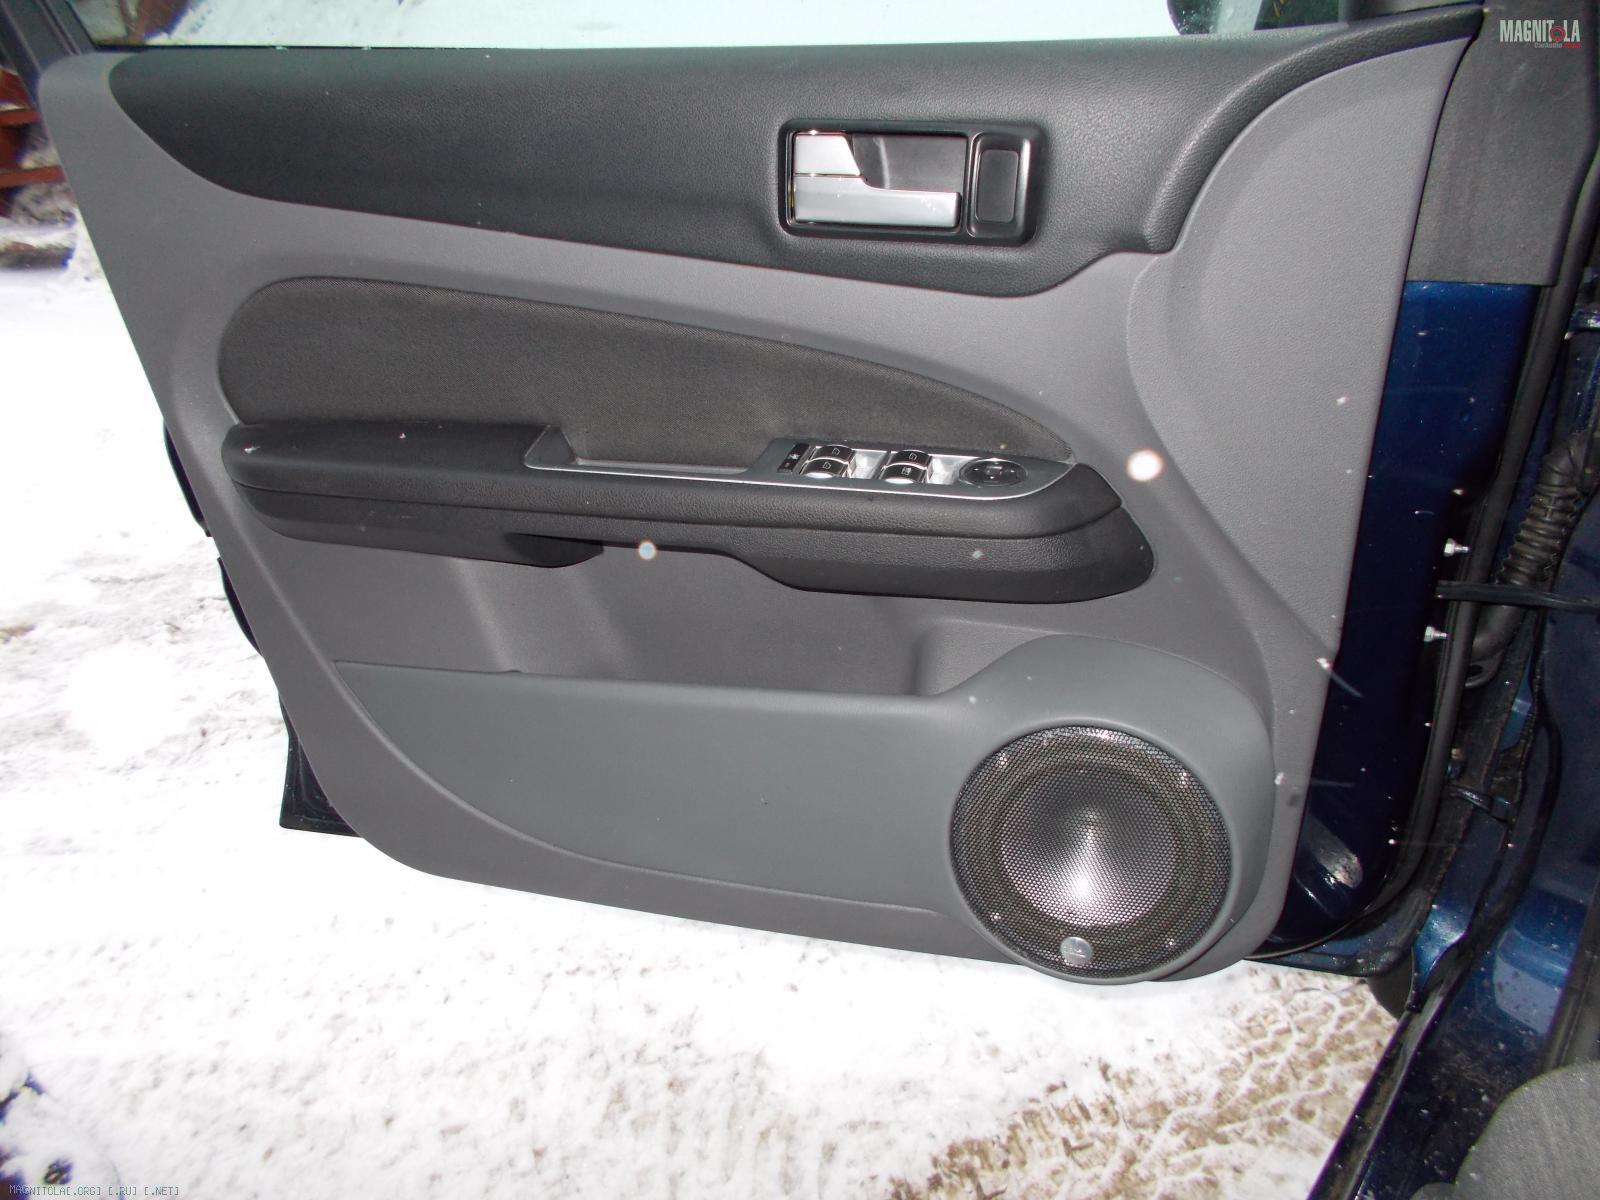 тюнинг Форд Фокус 2 (Ford Focus 2) - Колеса.ру